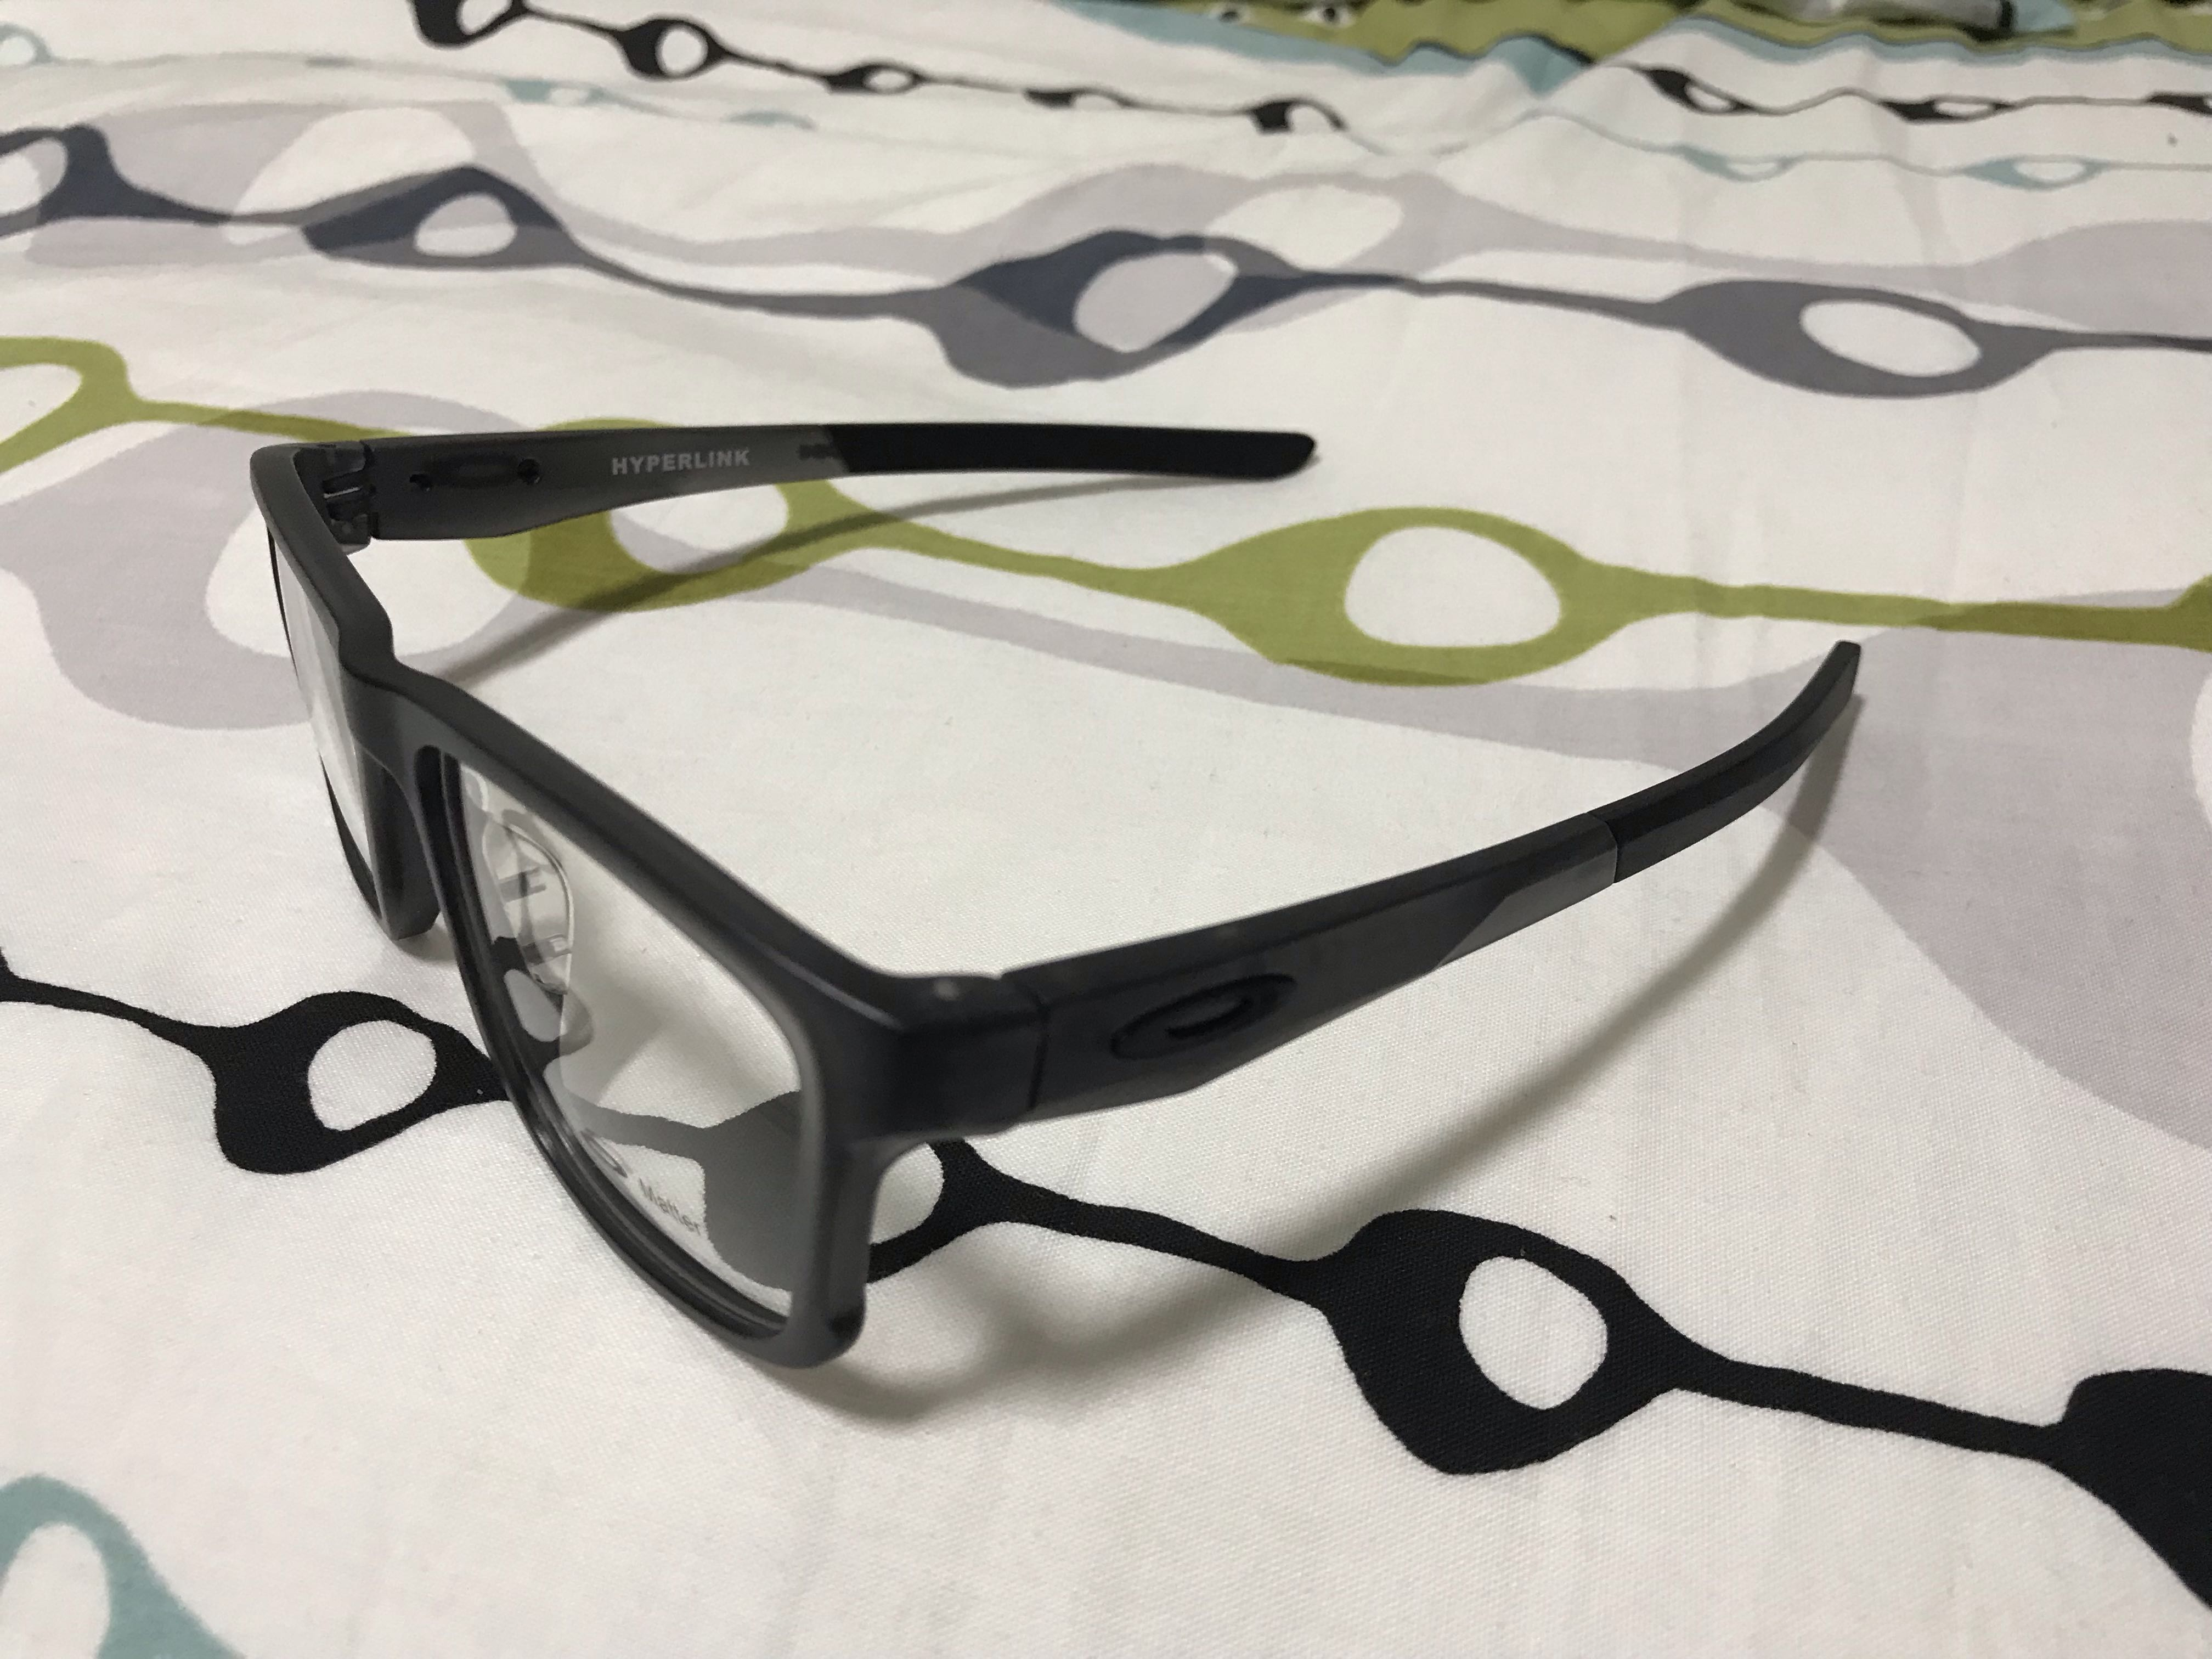 19dfff185c5 Brand New Oakley Hyperlink Prescription Frame